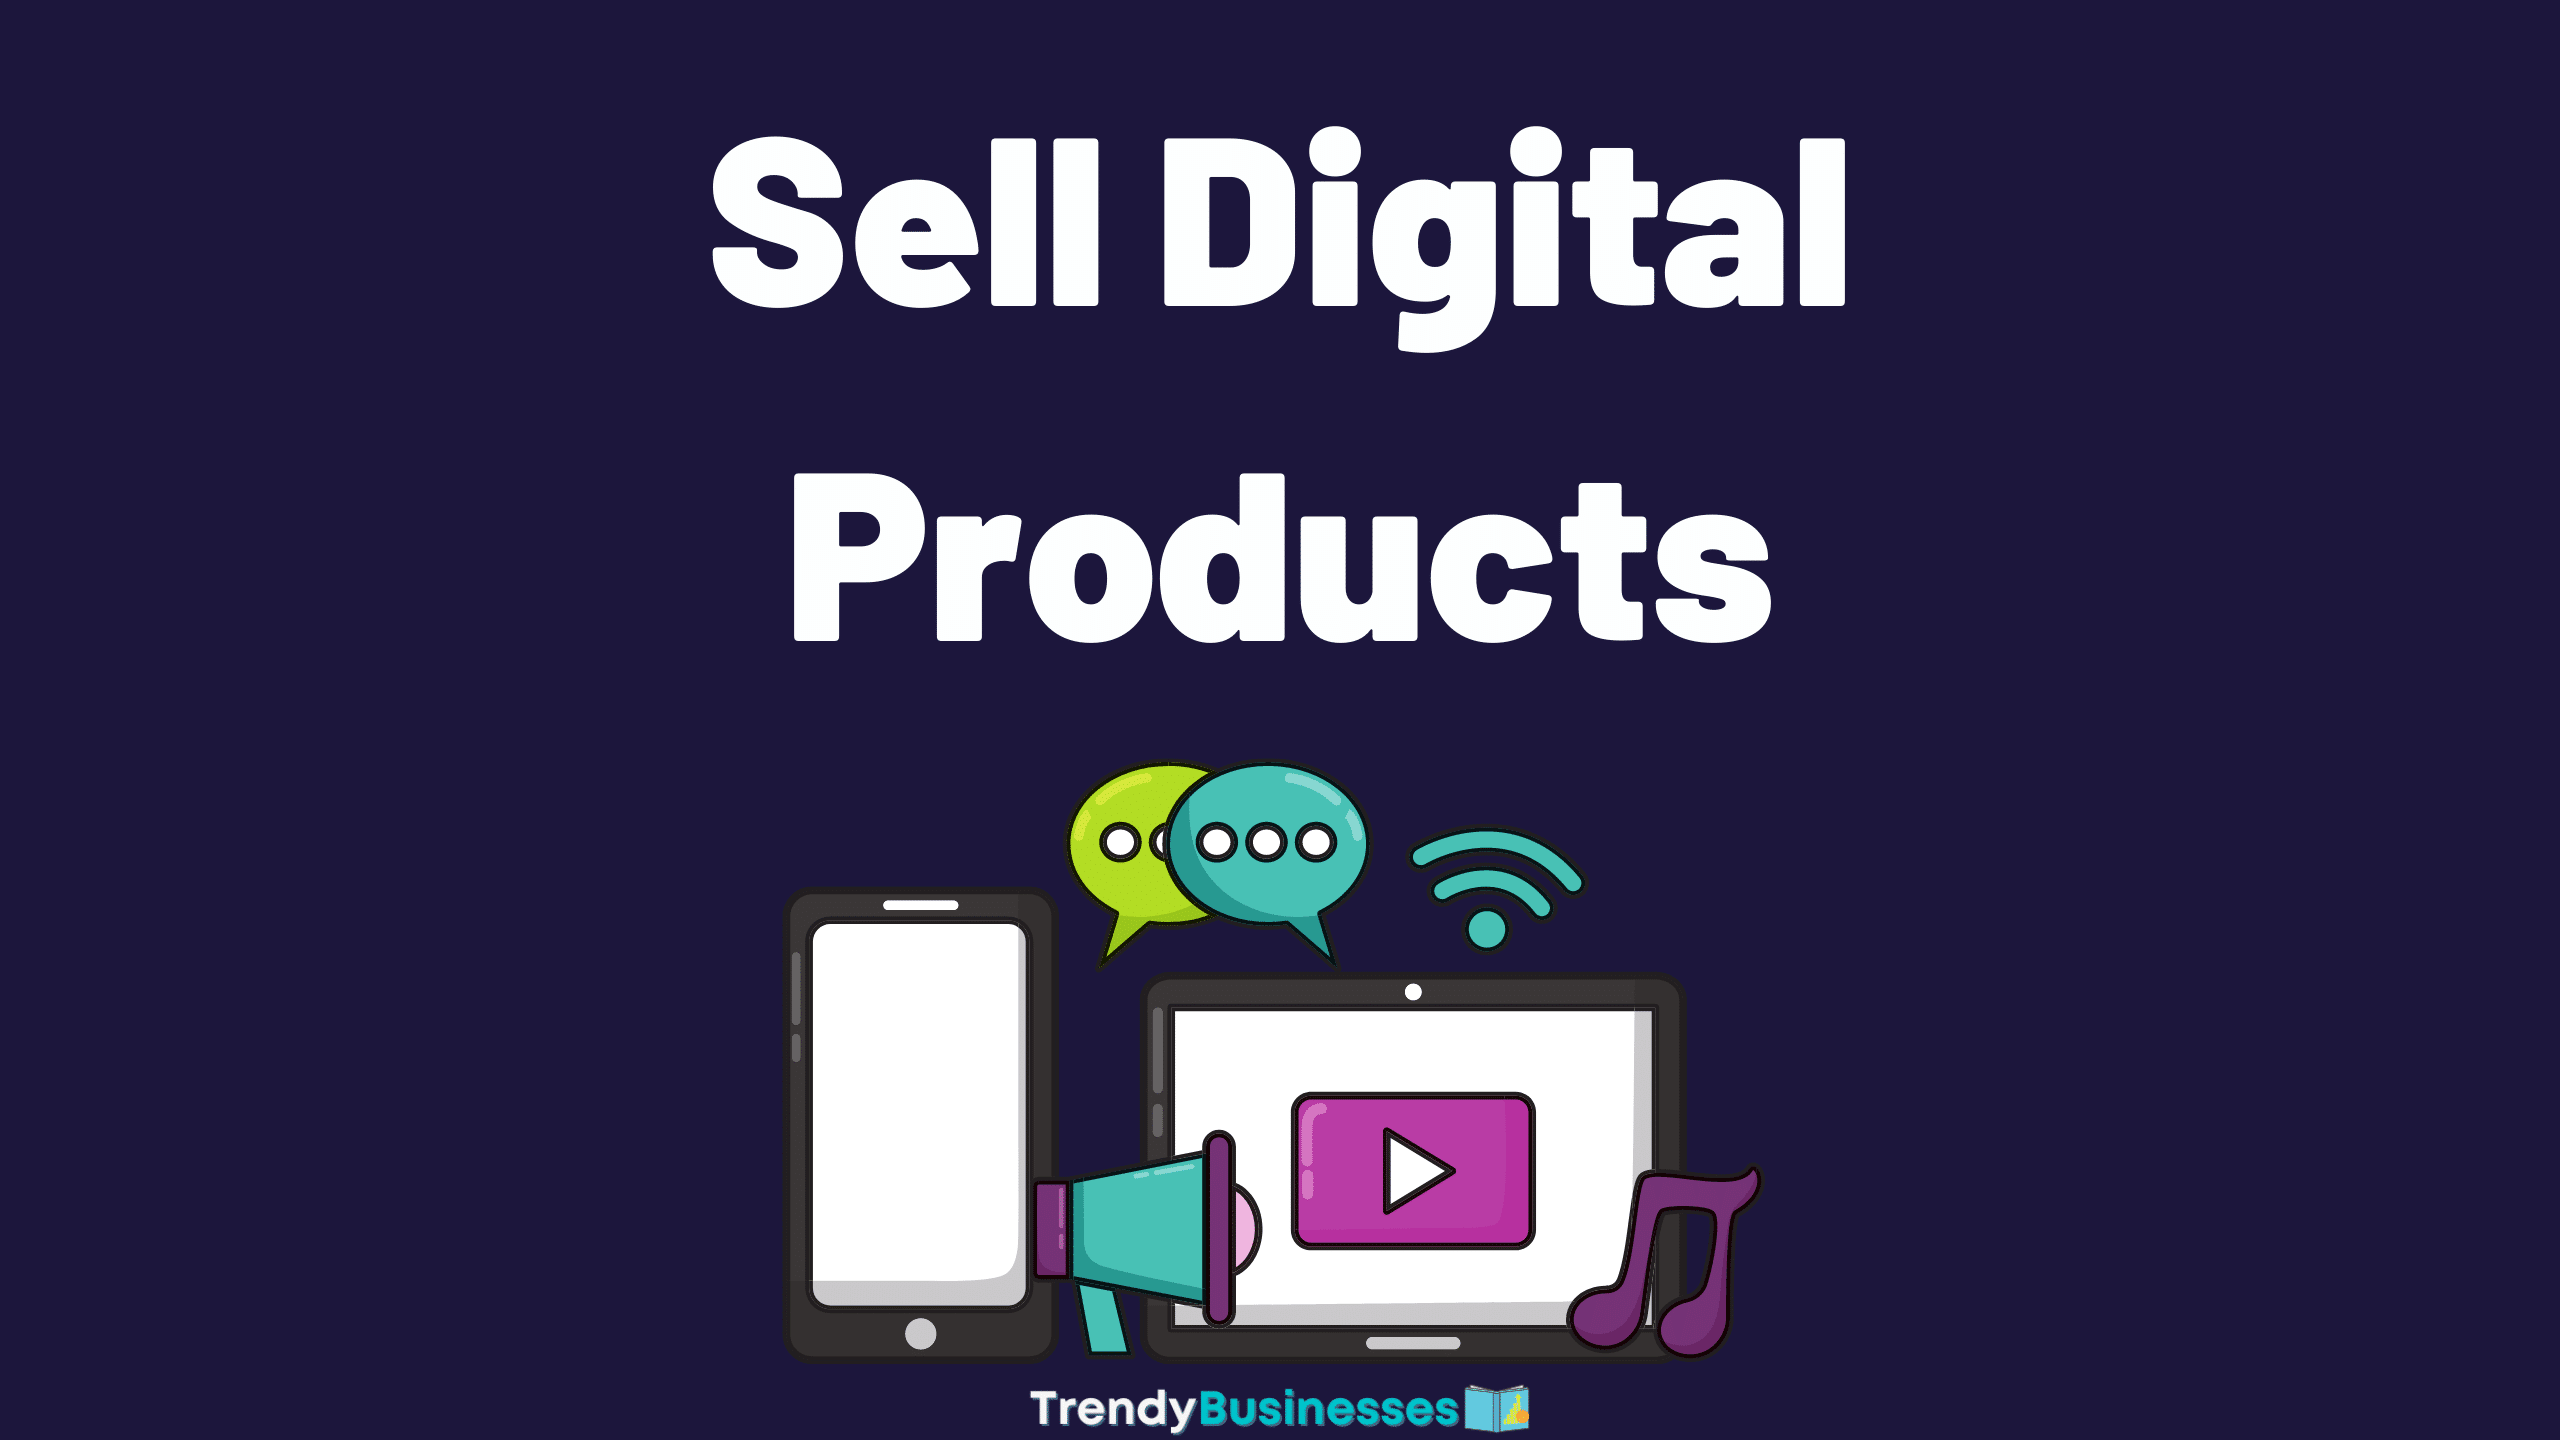 Digital Products Business Idea